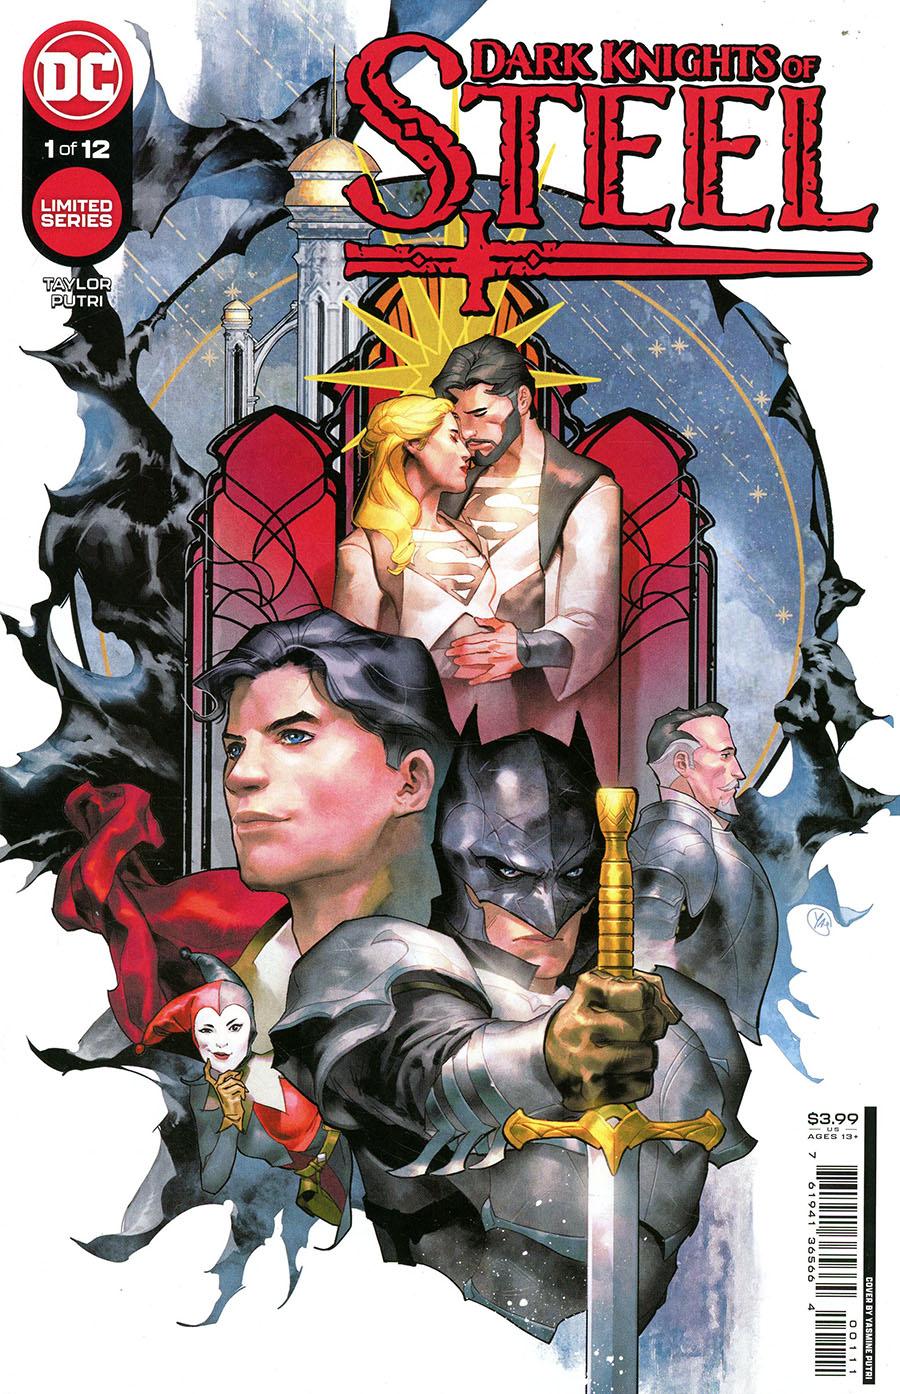 Dark Knights Of Steel #1 Cover A Regular Yasmine Putri Cover